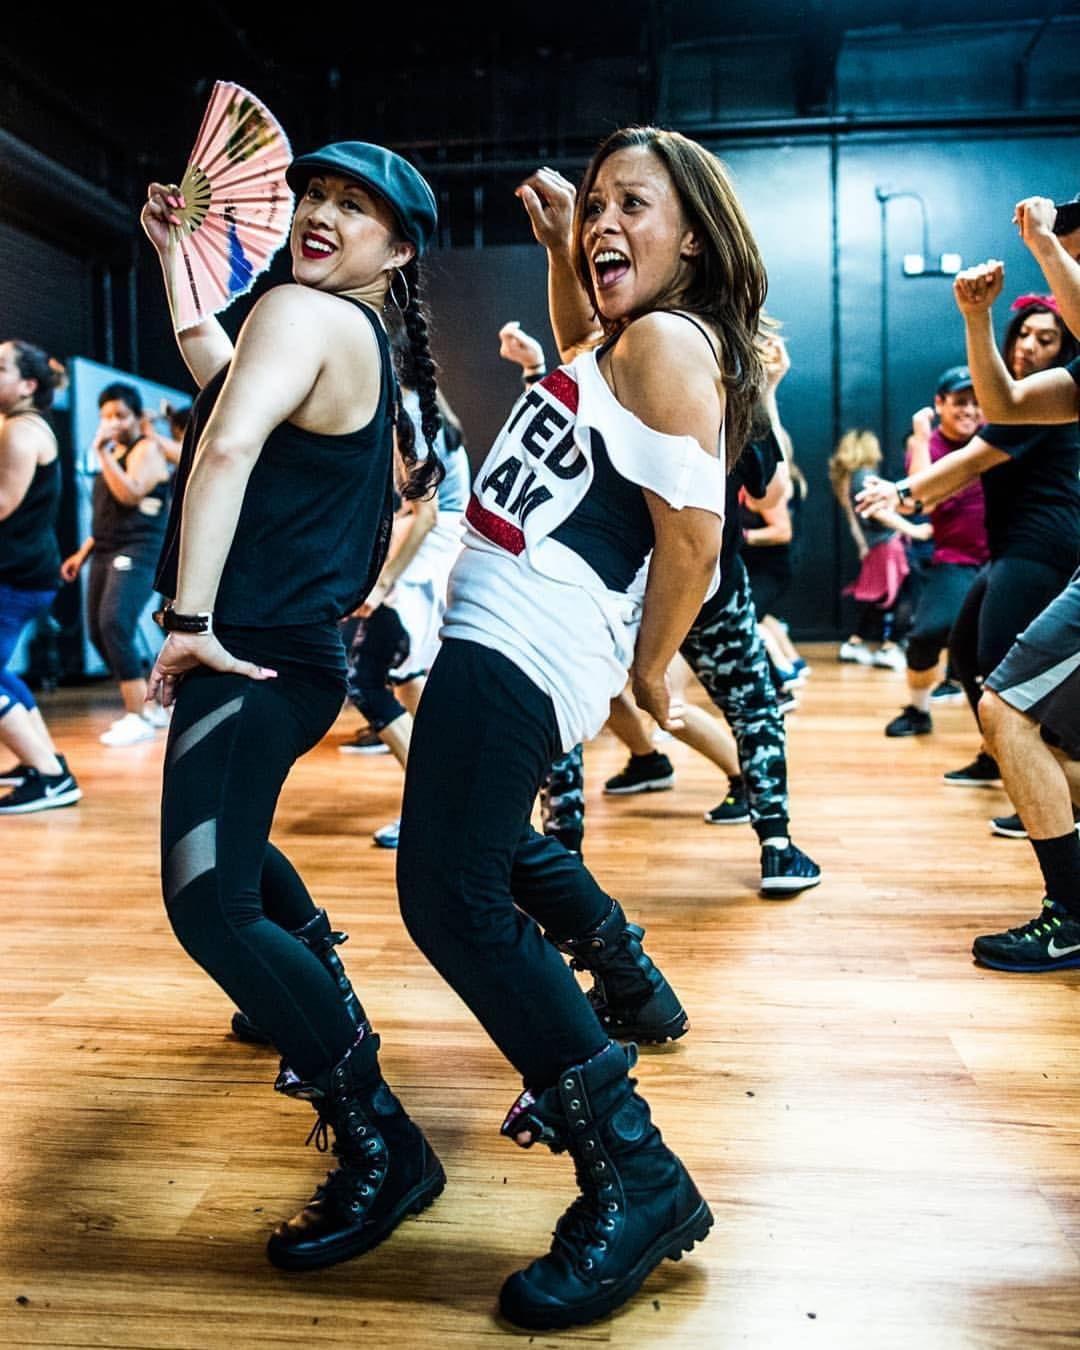 U Jam Fitness On Instagram U Jam Fitness Isn T Just A Class It S An Attitude Feat Navarska3 By Zbestfoto